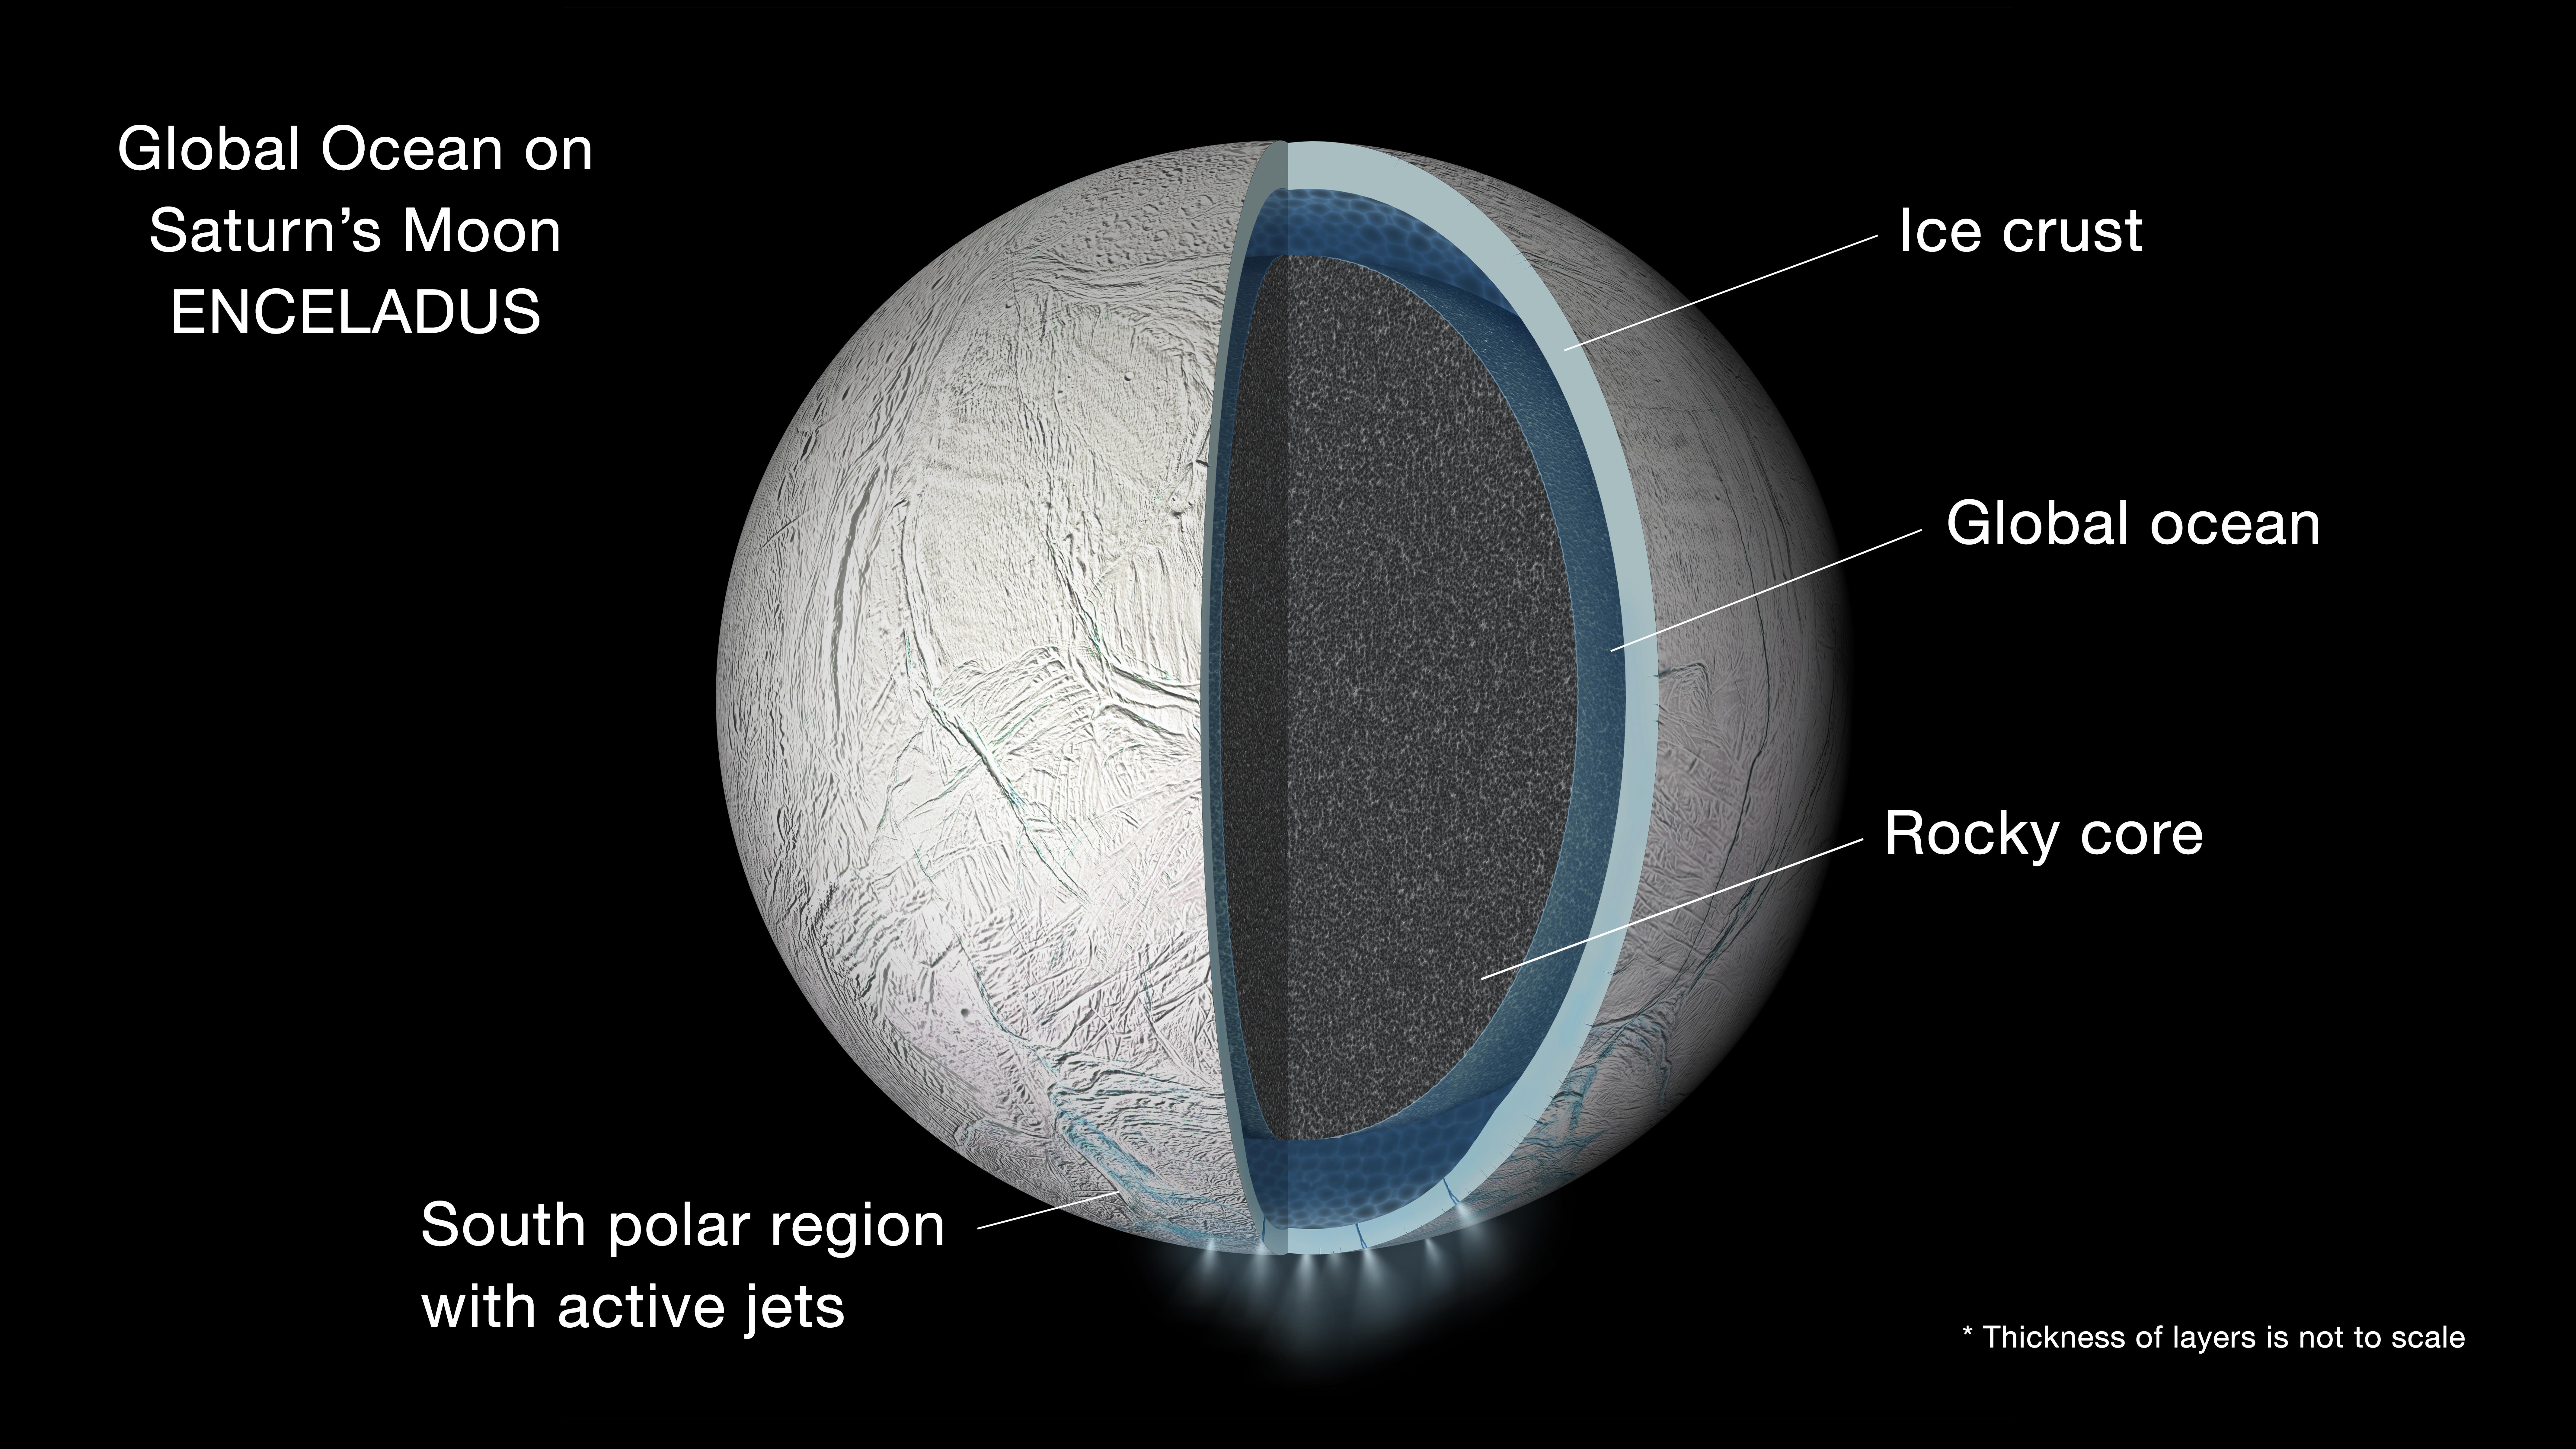 Credits: NASA/JPL-Caltech